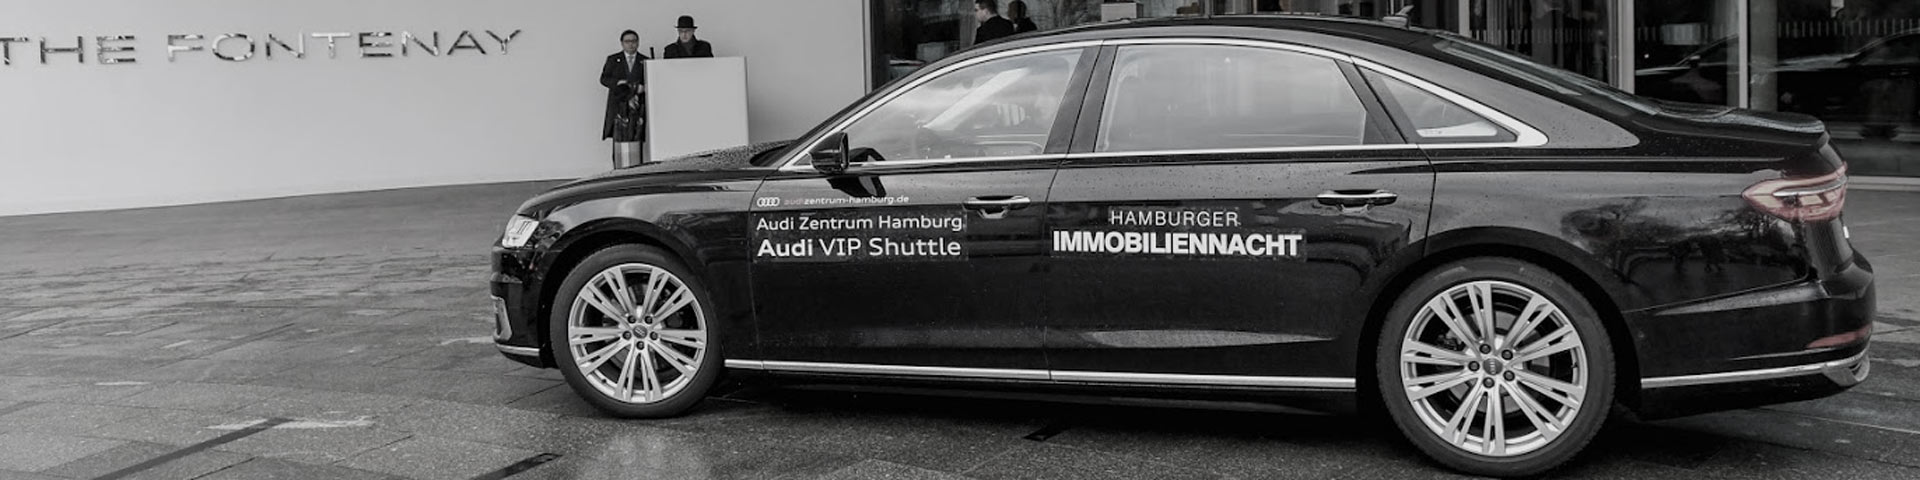 Hamburger Immobiliennacht 2018 – im The Fontenay